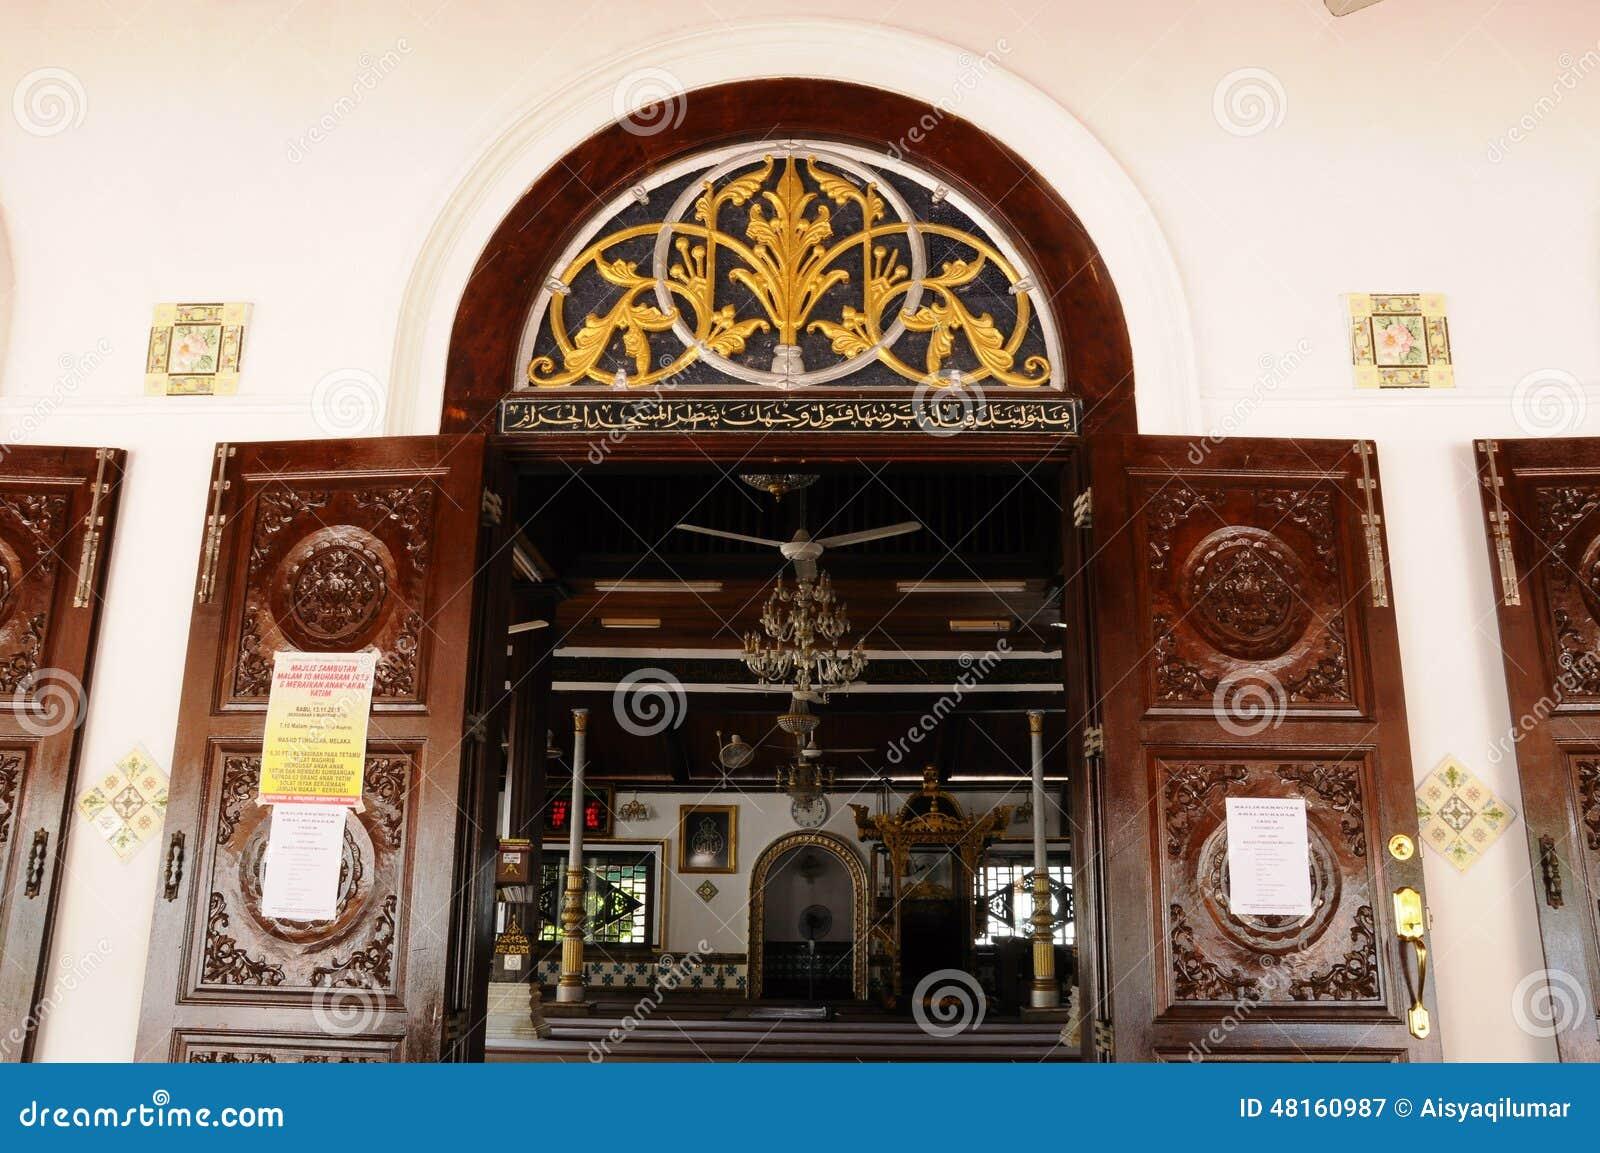 Main door of Masjid Tengkera (Tranquerah Mosque) in Malacca Royalty Free Stock Photography & Mosque Main Door Stock Photos - Royalty Free Images pezcame.com